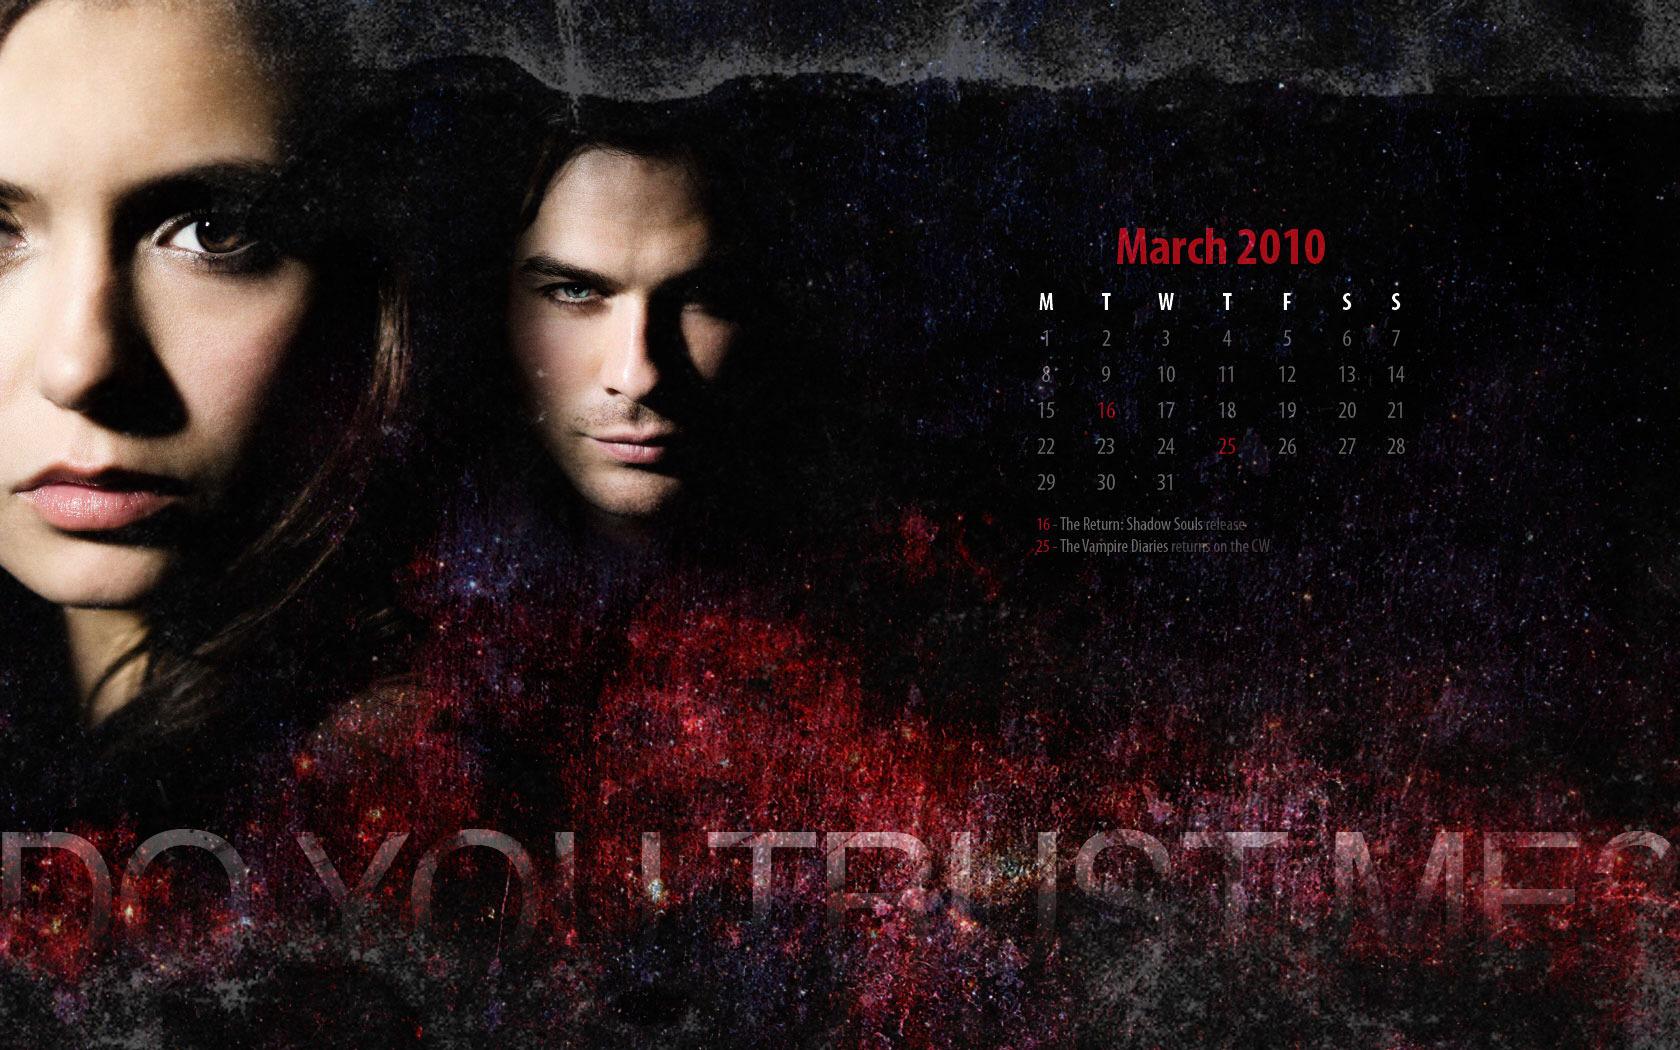 Damon and Elena Wallpaper   The Vampire Diaries TV Show Wallpaper 1680x1050